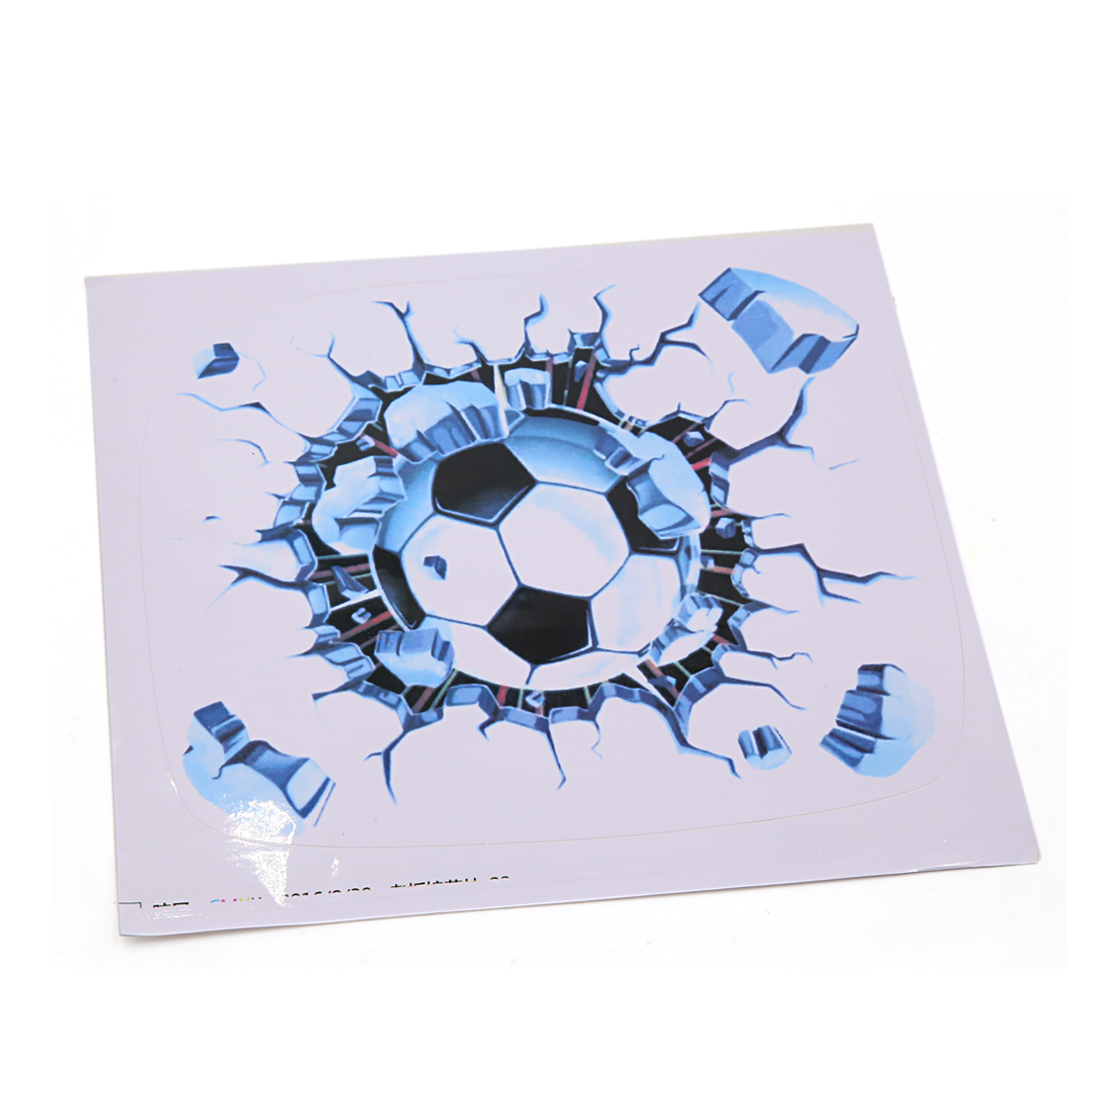 21 x 20cm 3D Soccer Pattern Car Automobile Decorative Decal Sticker